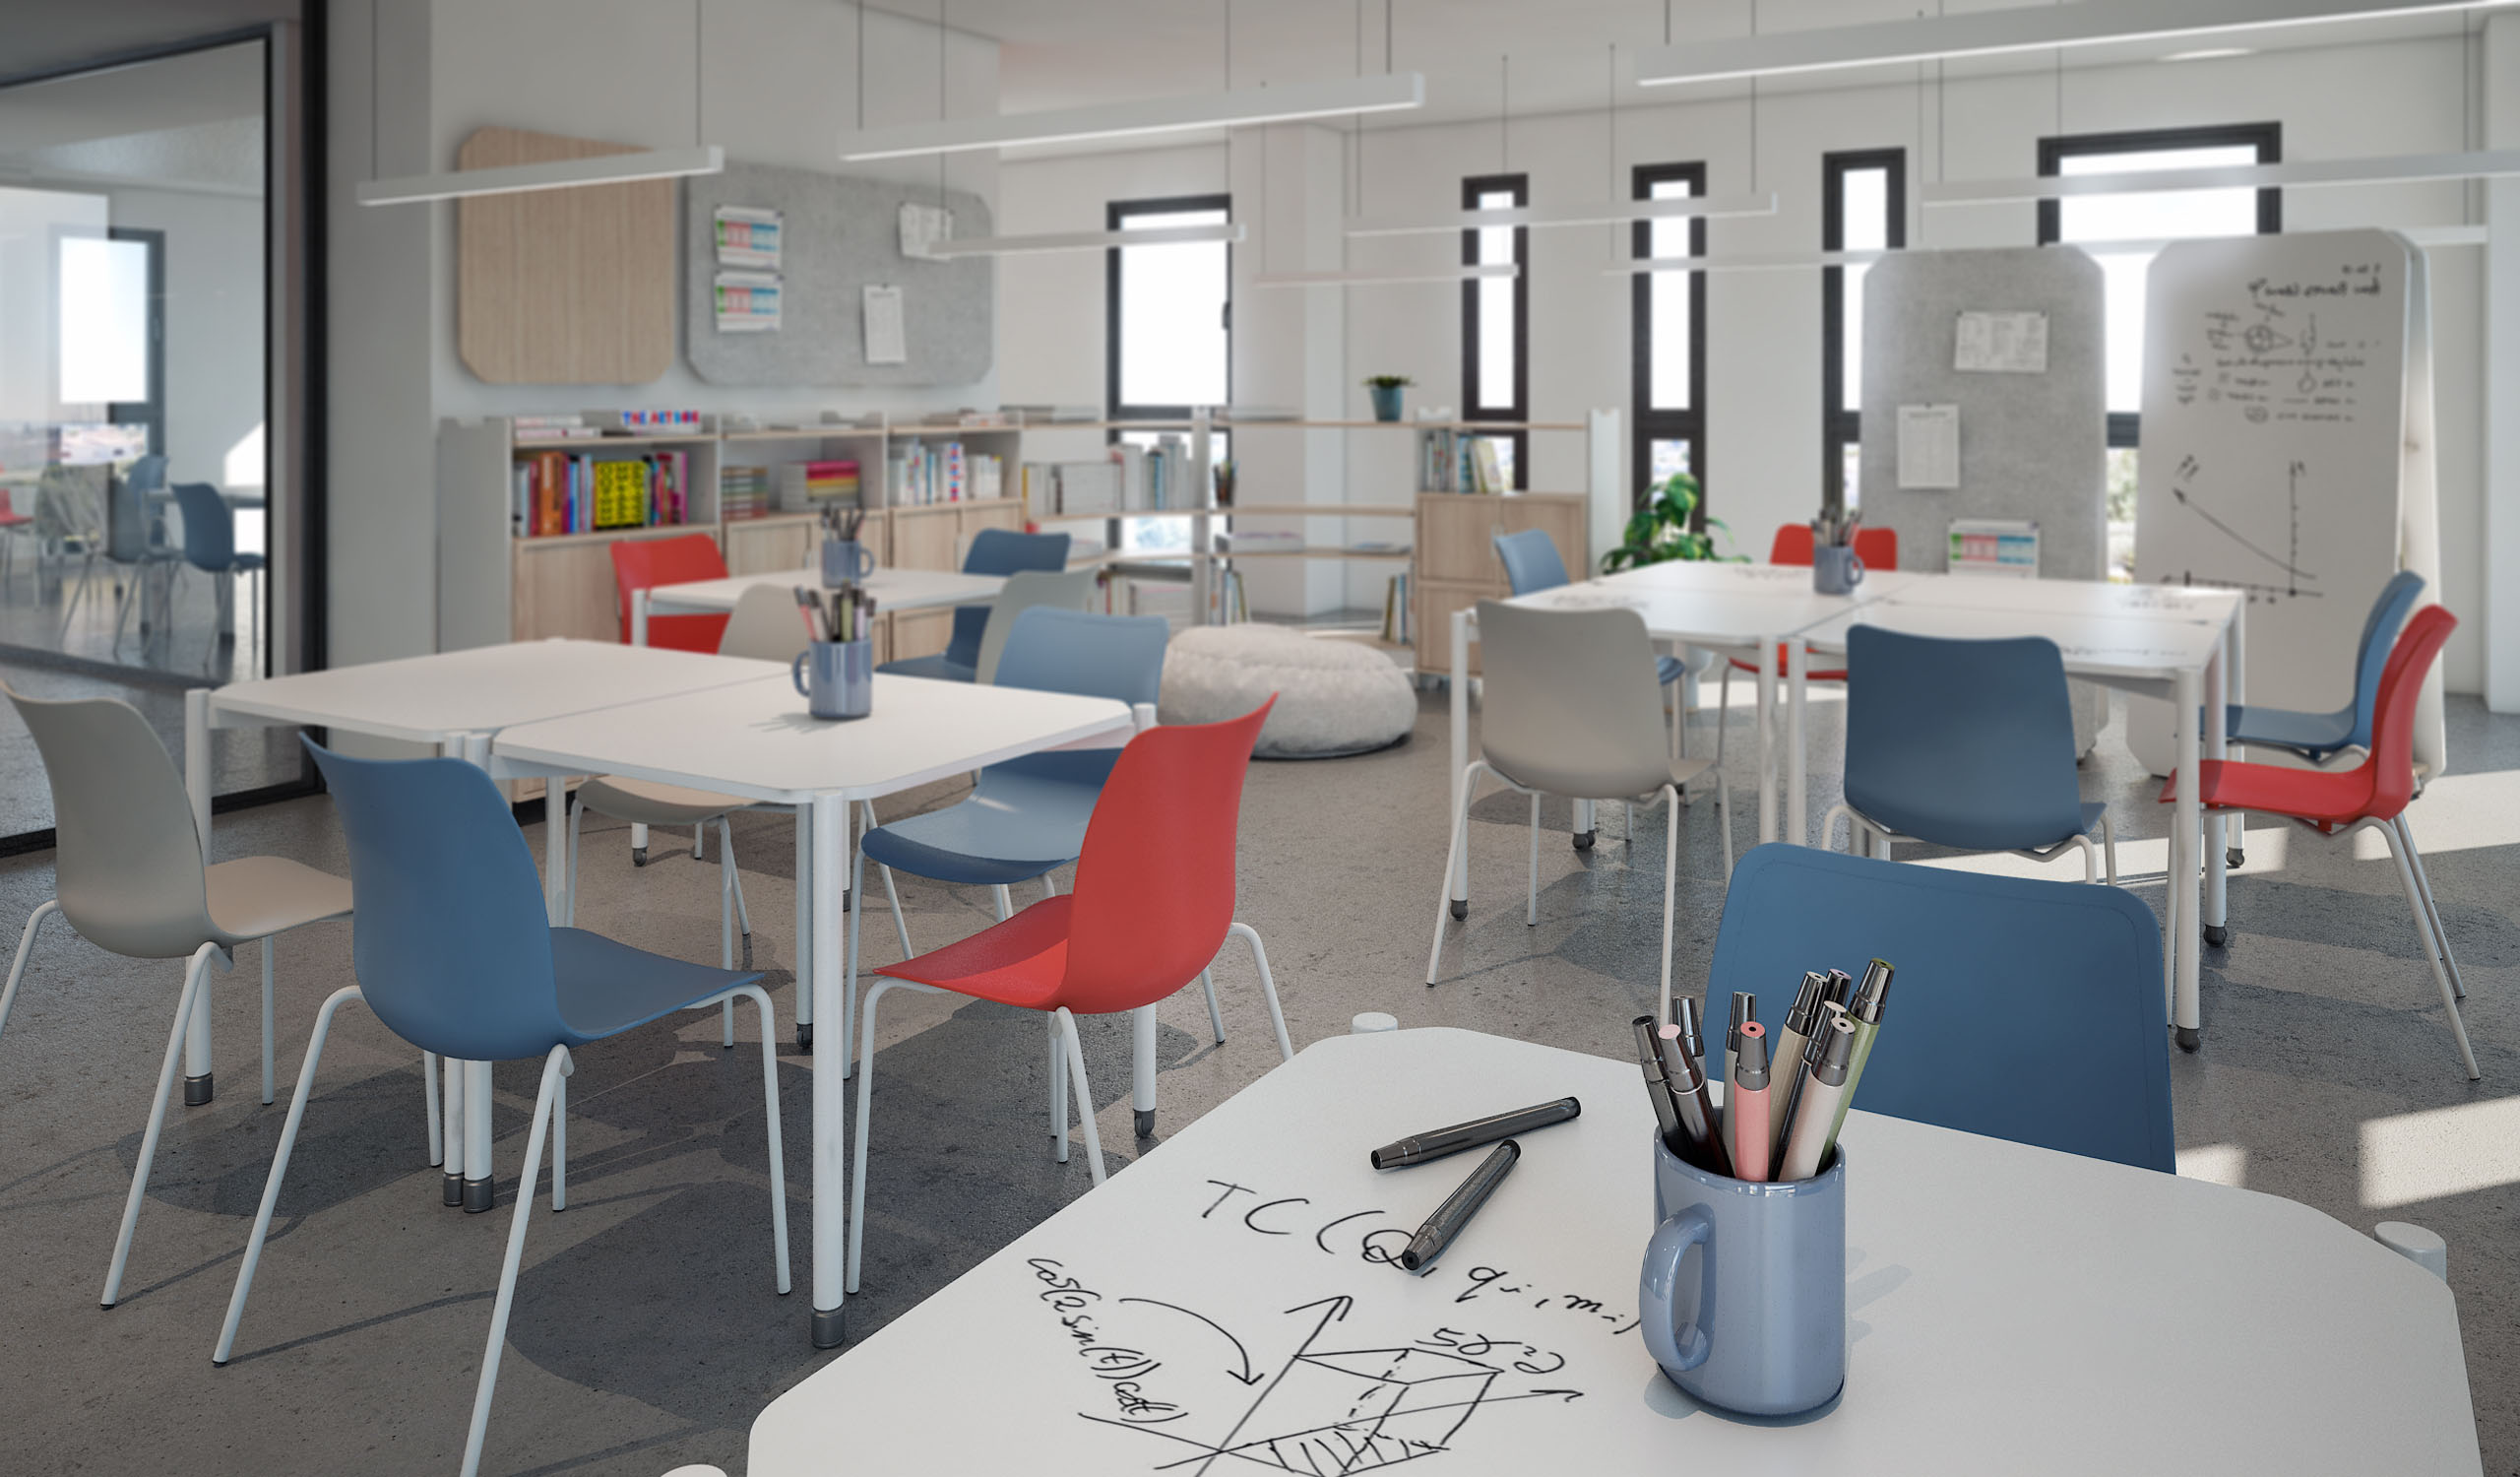 Vintiquatre Colecciones Tóteem Teepee Grupp Ulkia collage office almacenaje producto mobiliario diseño